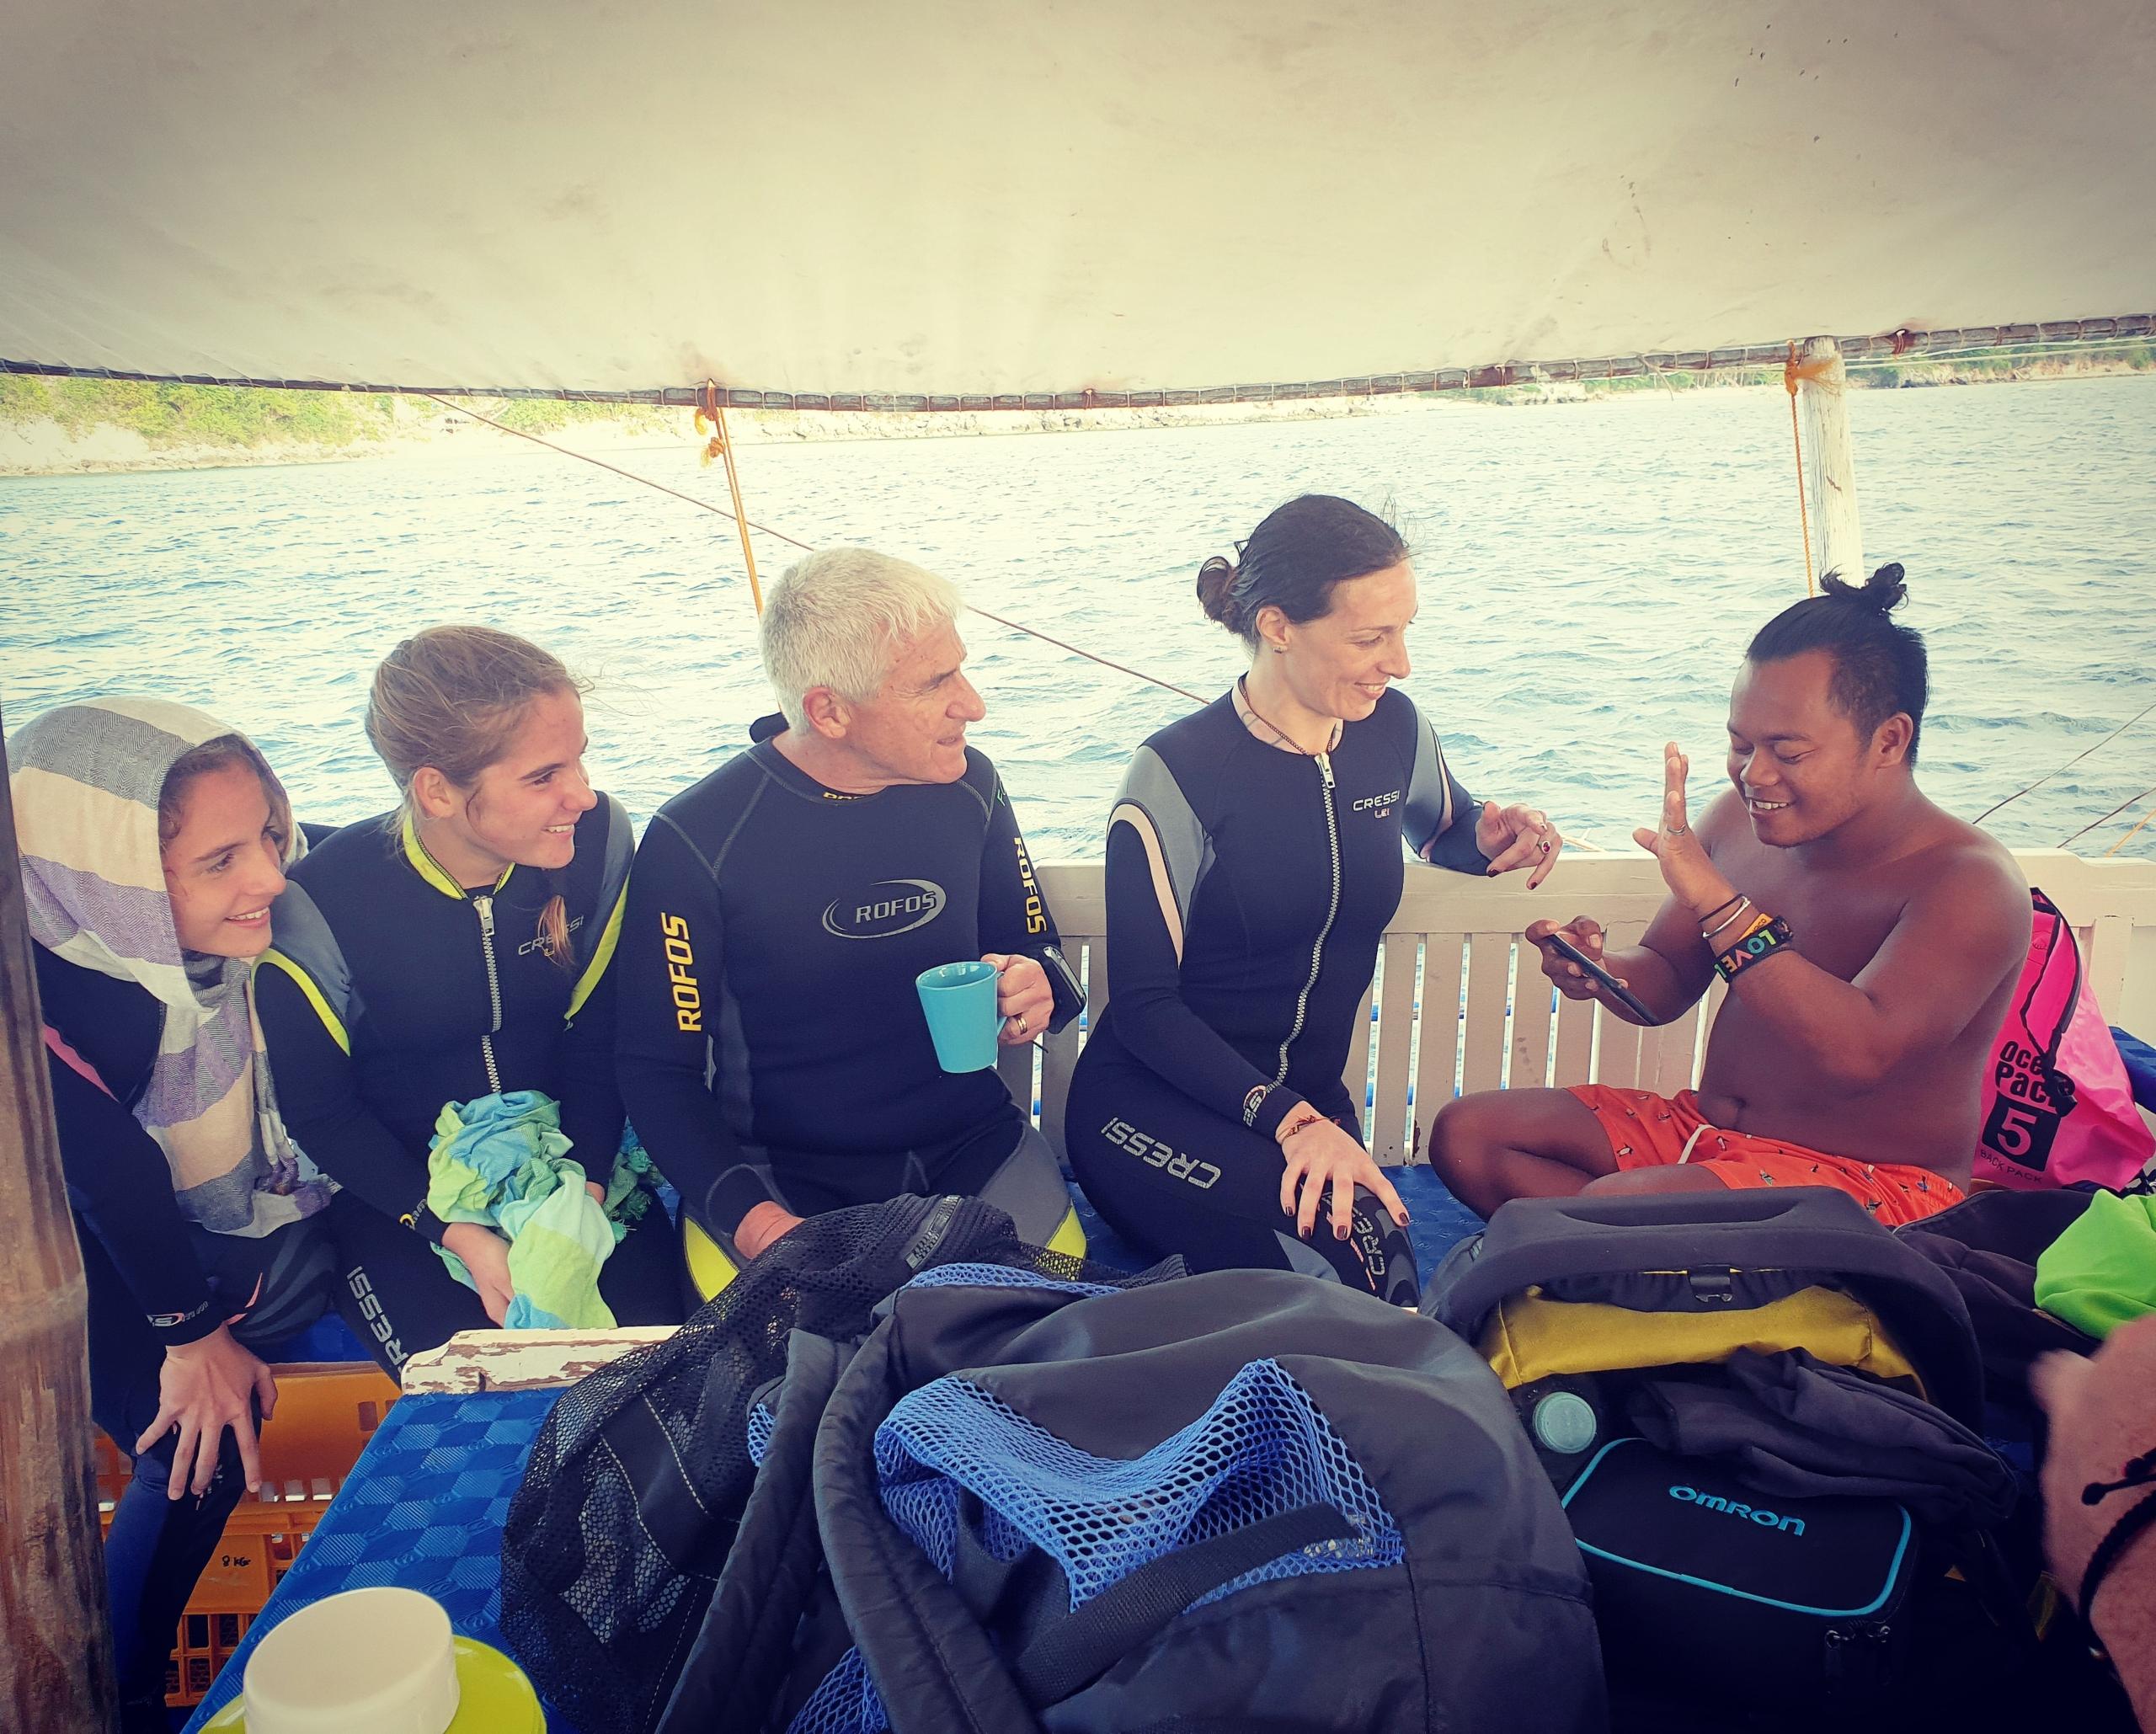 Isola di Malapasqua, OOgiata Diving Febbraio 2020, People 8